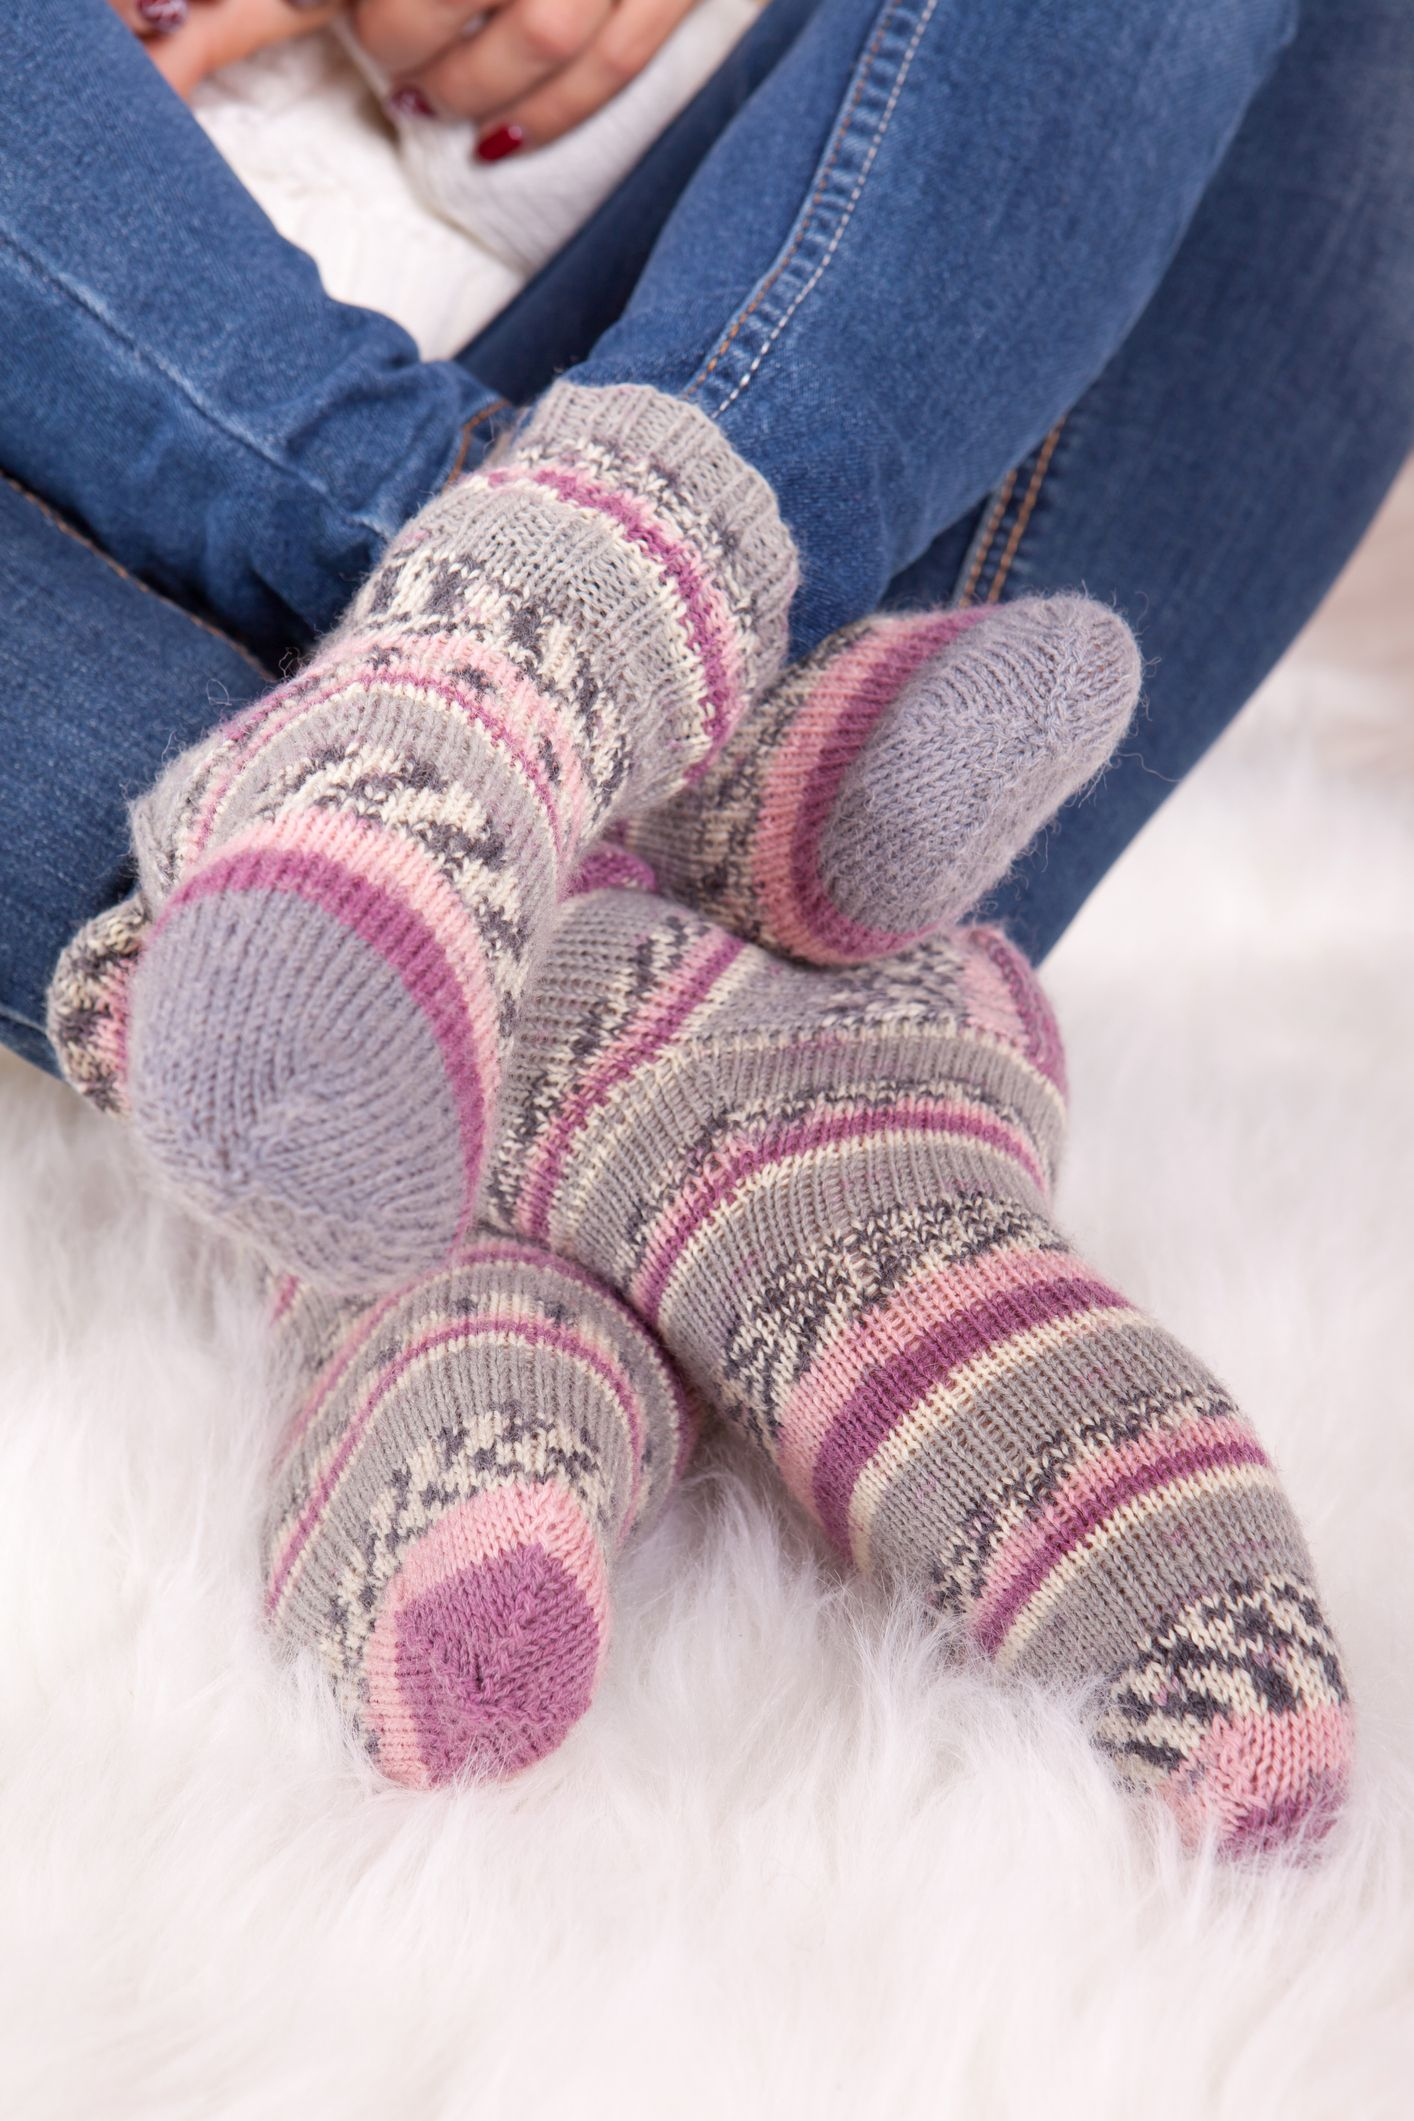 keep feet warm - how not to get sick